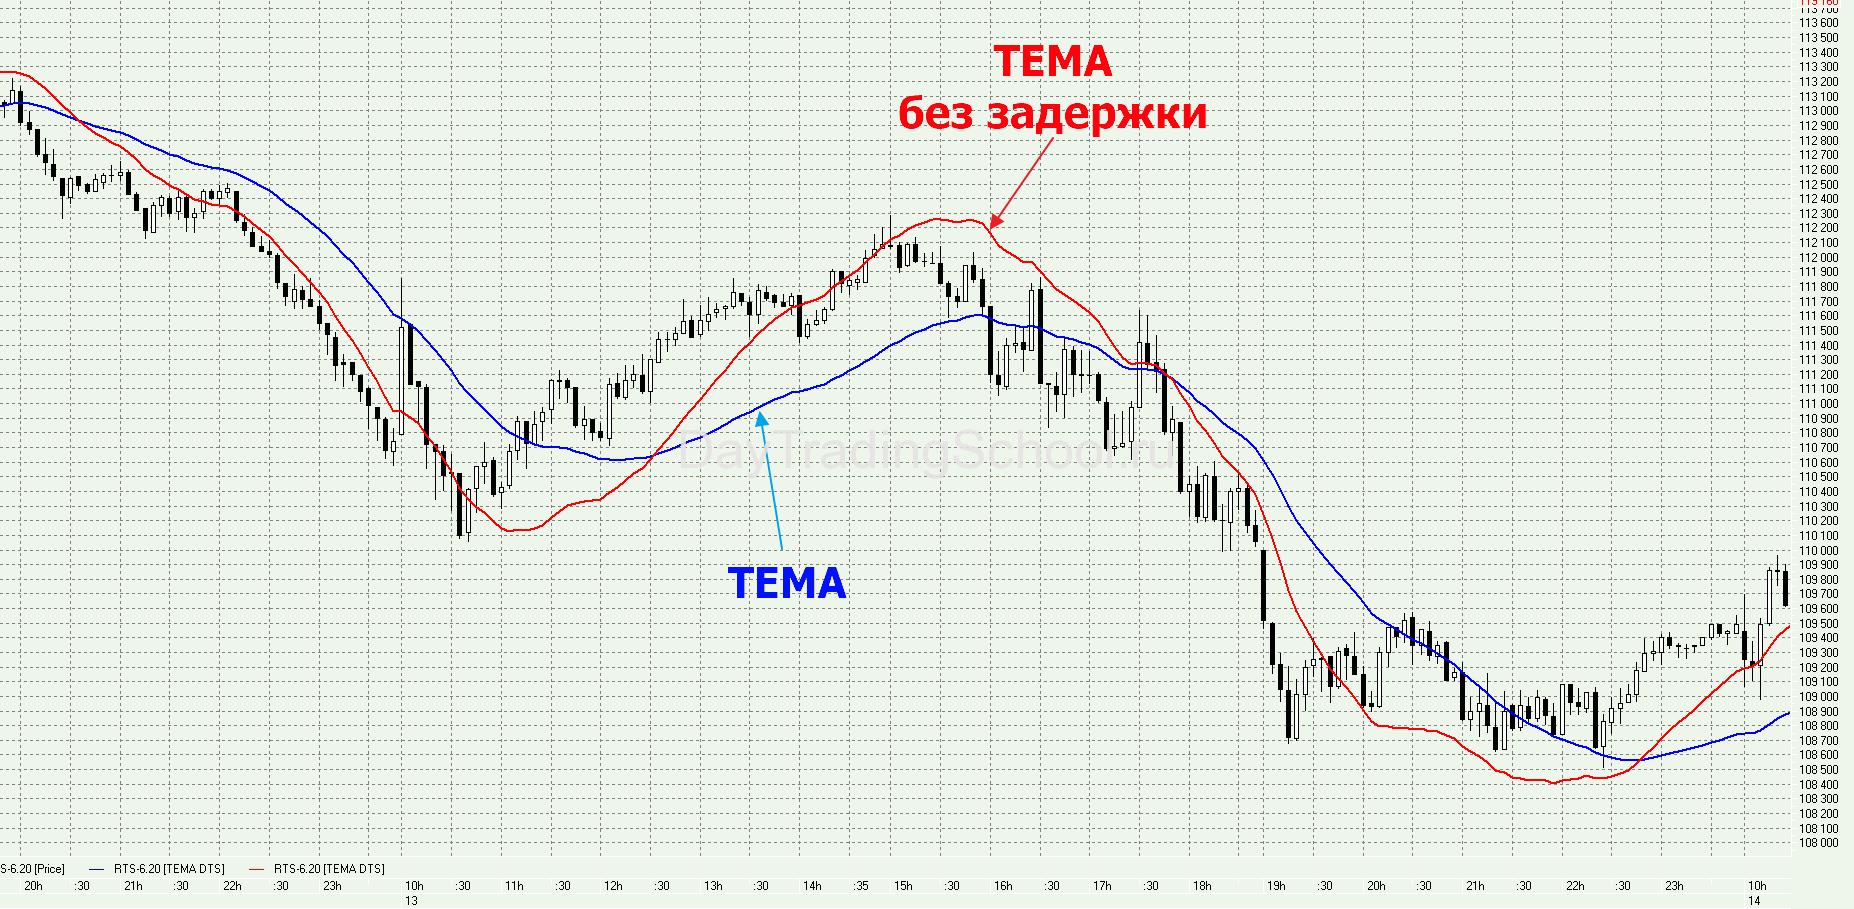 ТЕМА-и-Тема-zero-lag-график-сравнение